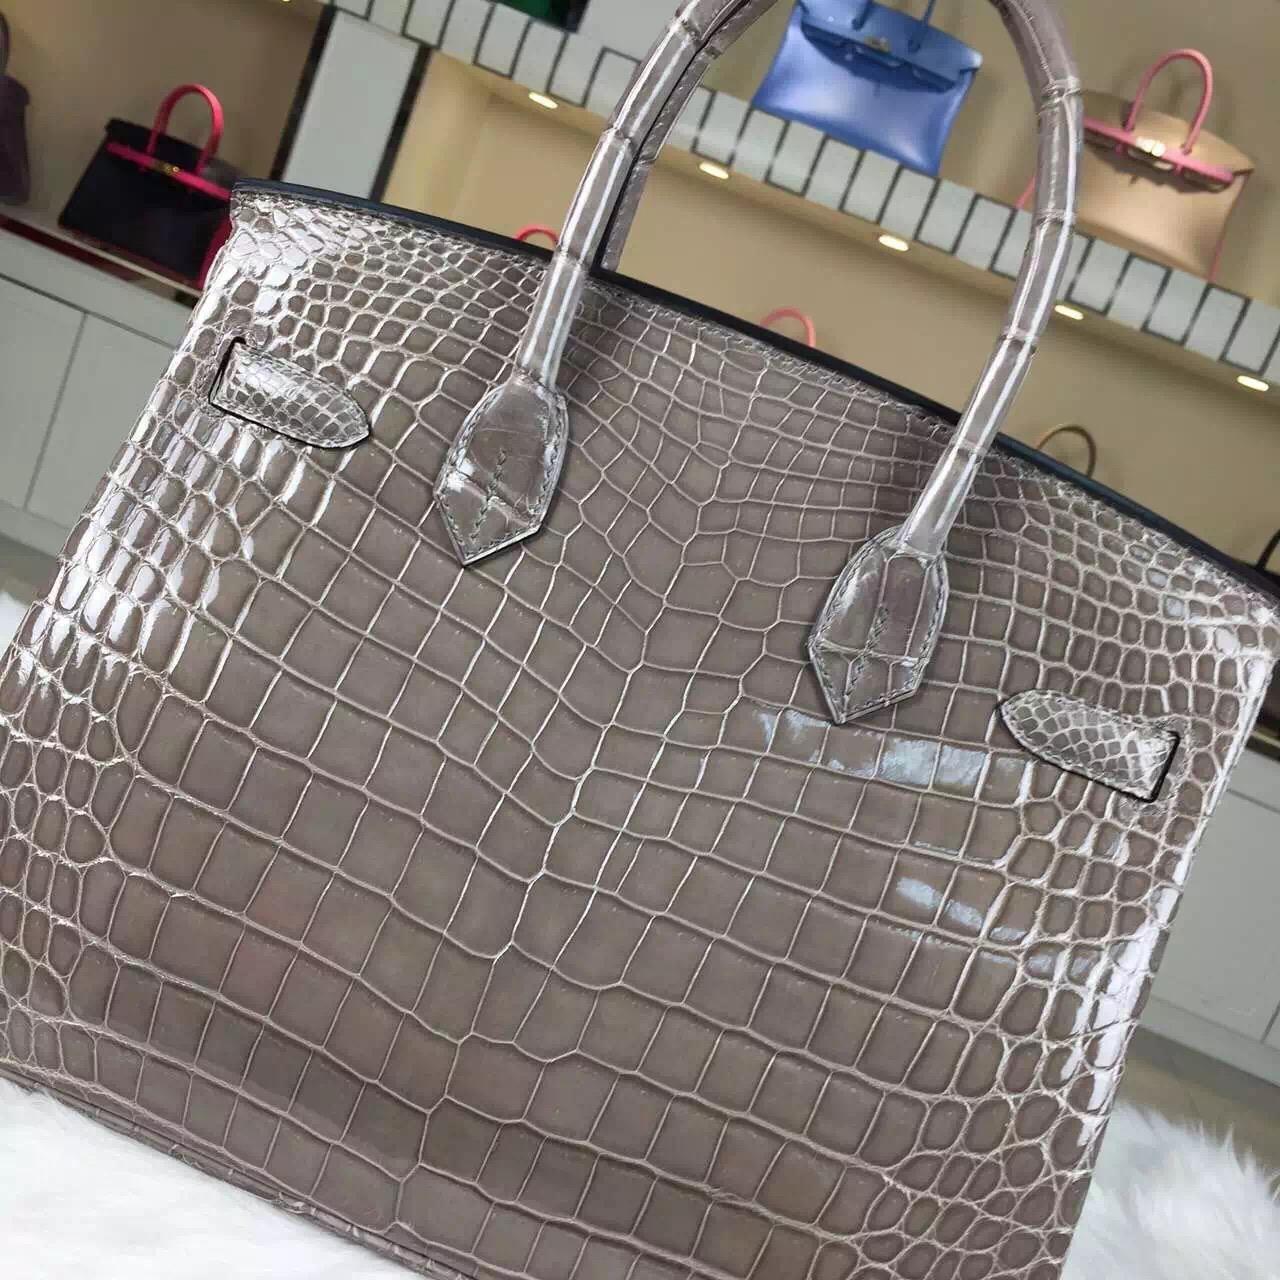 On Sale Hermes Mousse Grey HCP Original Crocodile Leather Birkin Bag30cm Ladies' Handbag